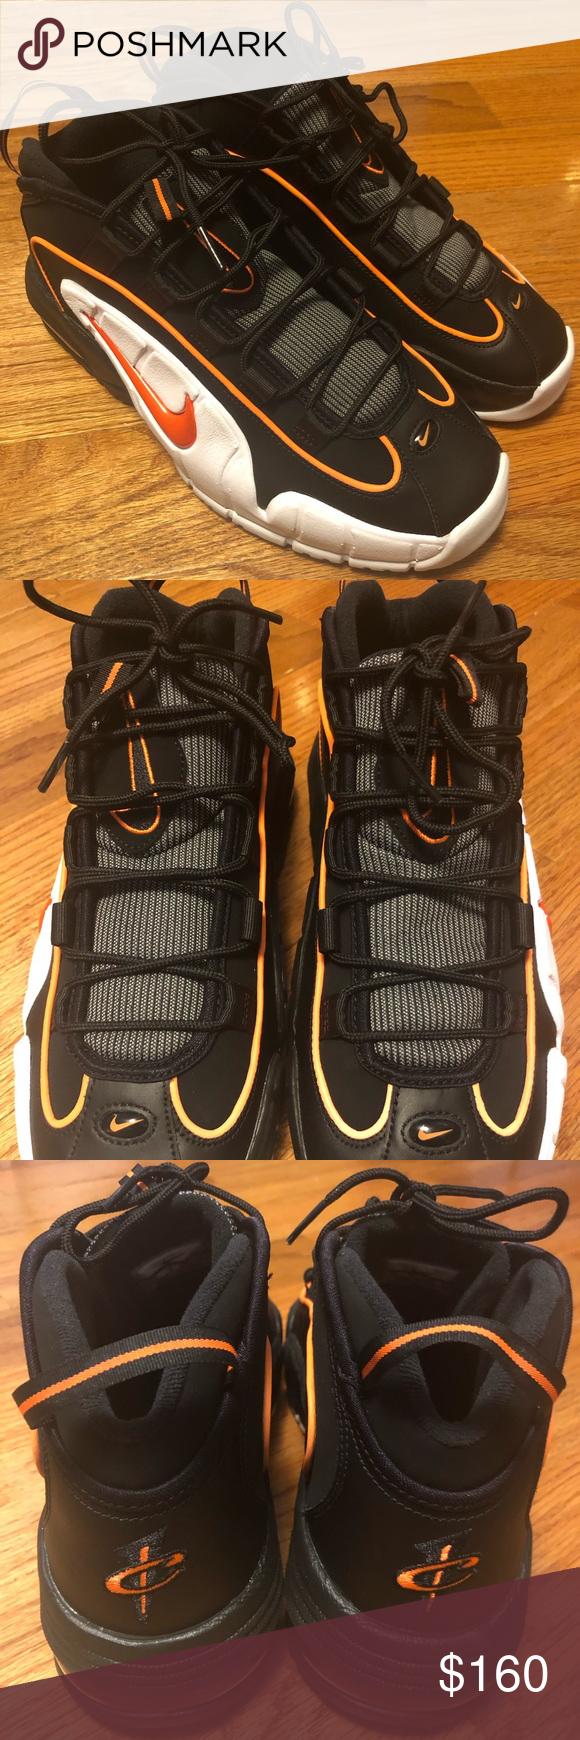 new arrival 00638 5a91e Nike Air Max Penny 1 Black Total Orange White !!! BRAND NEW !